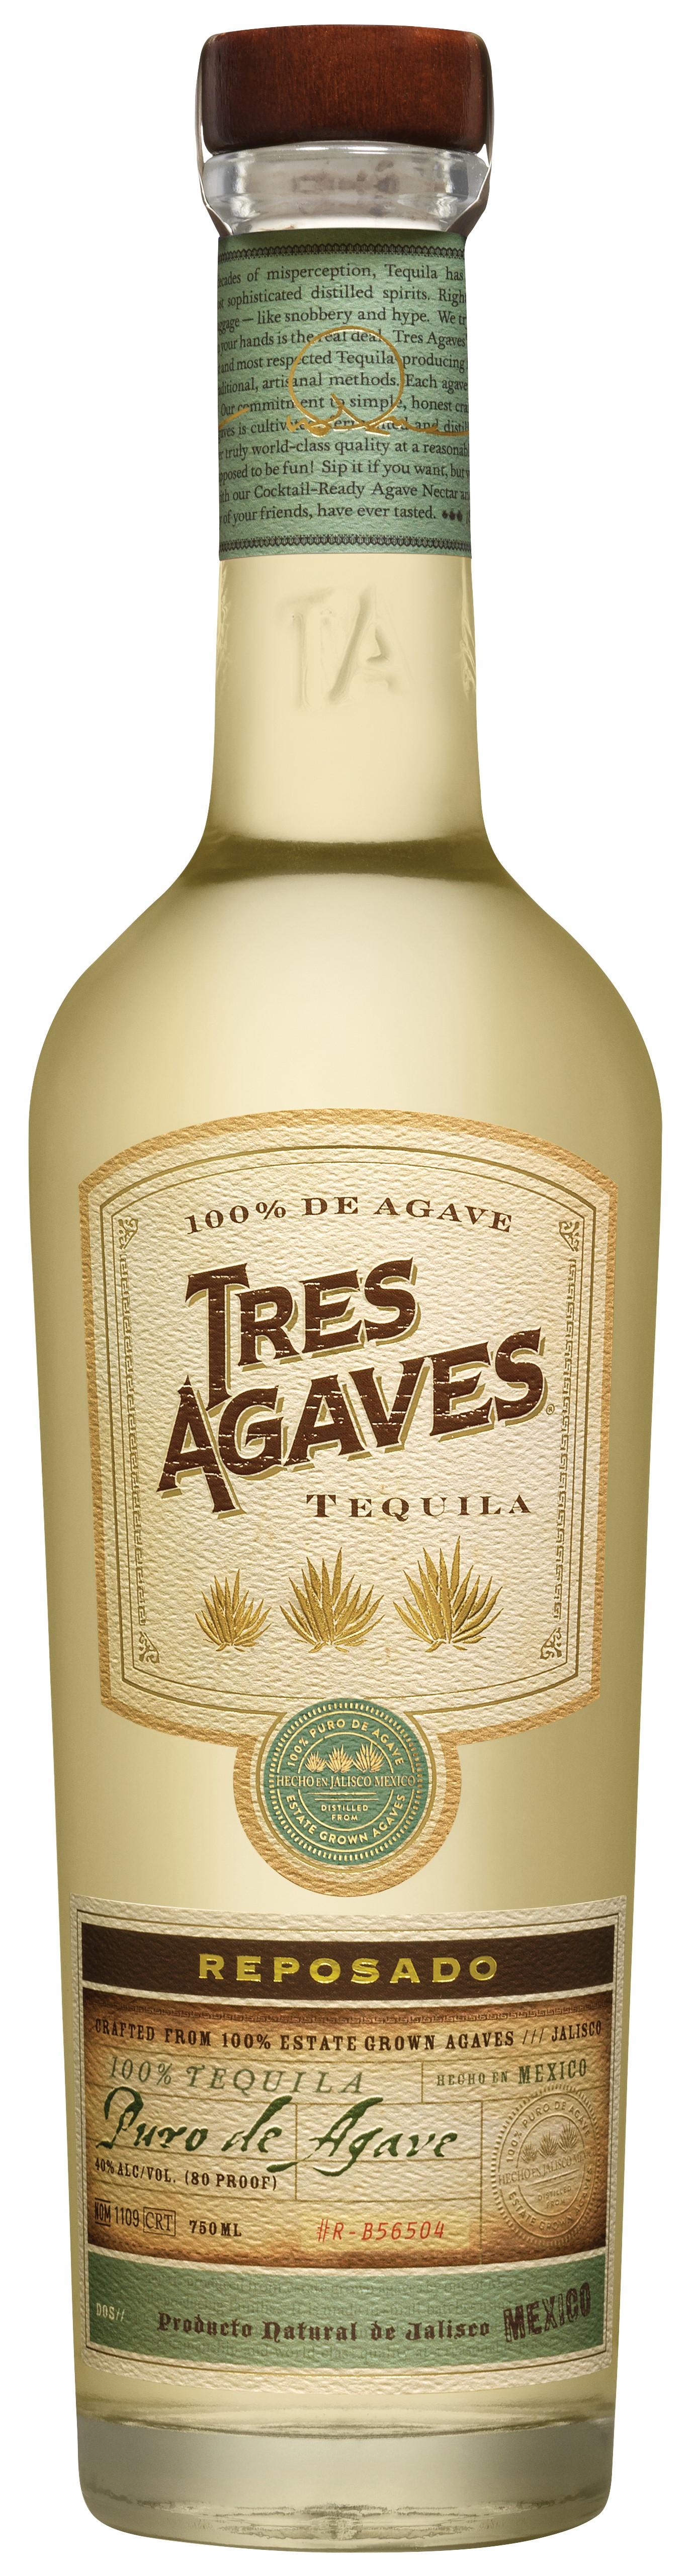 Tres Agaves Reposado Tequila Review Margarita Texas